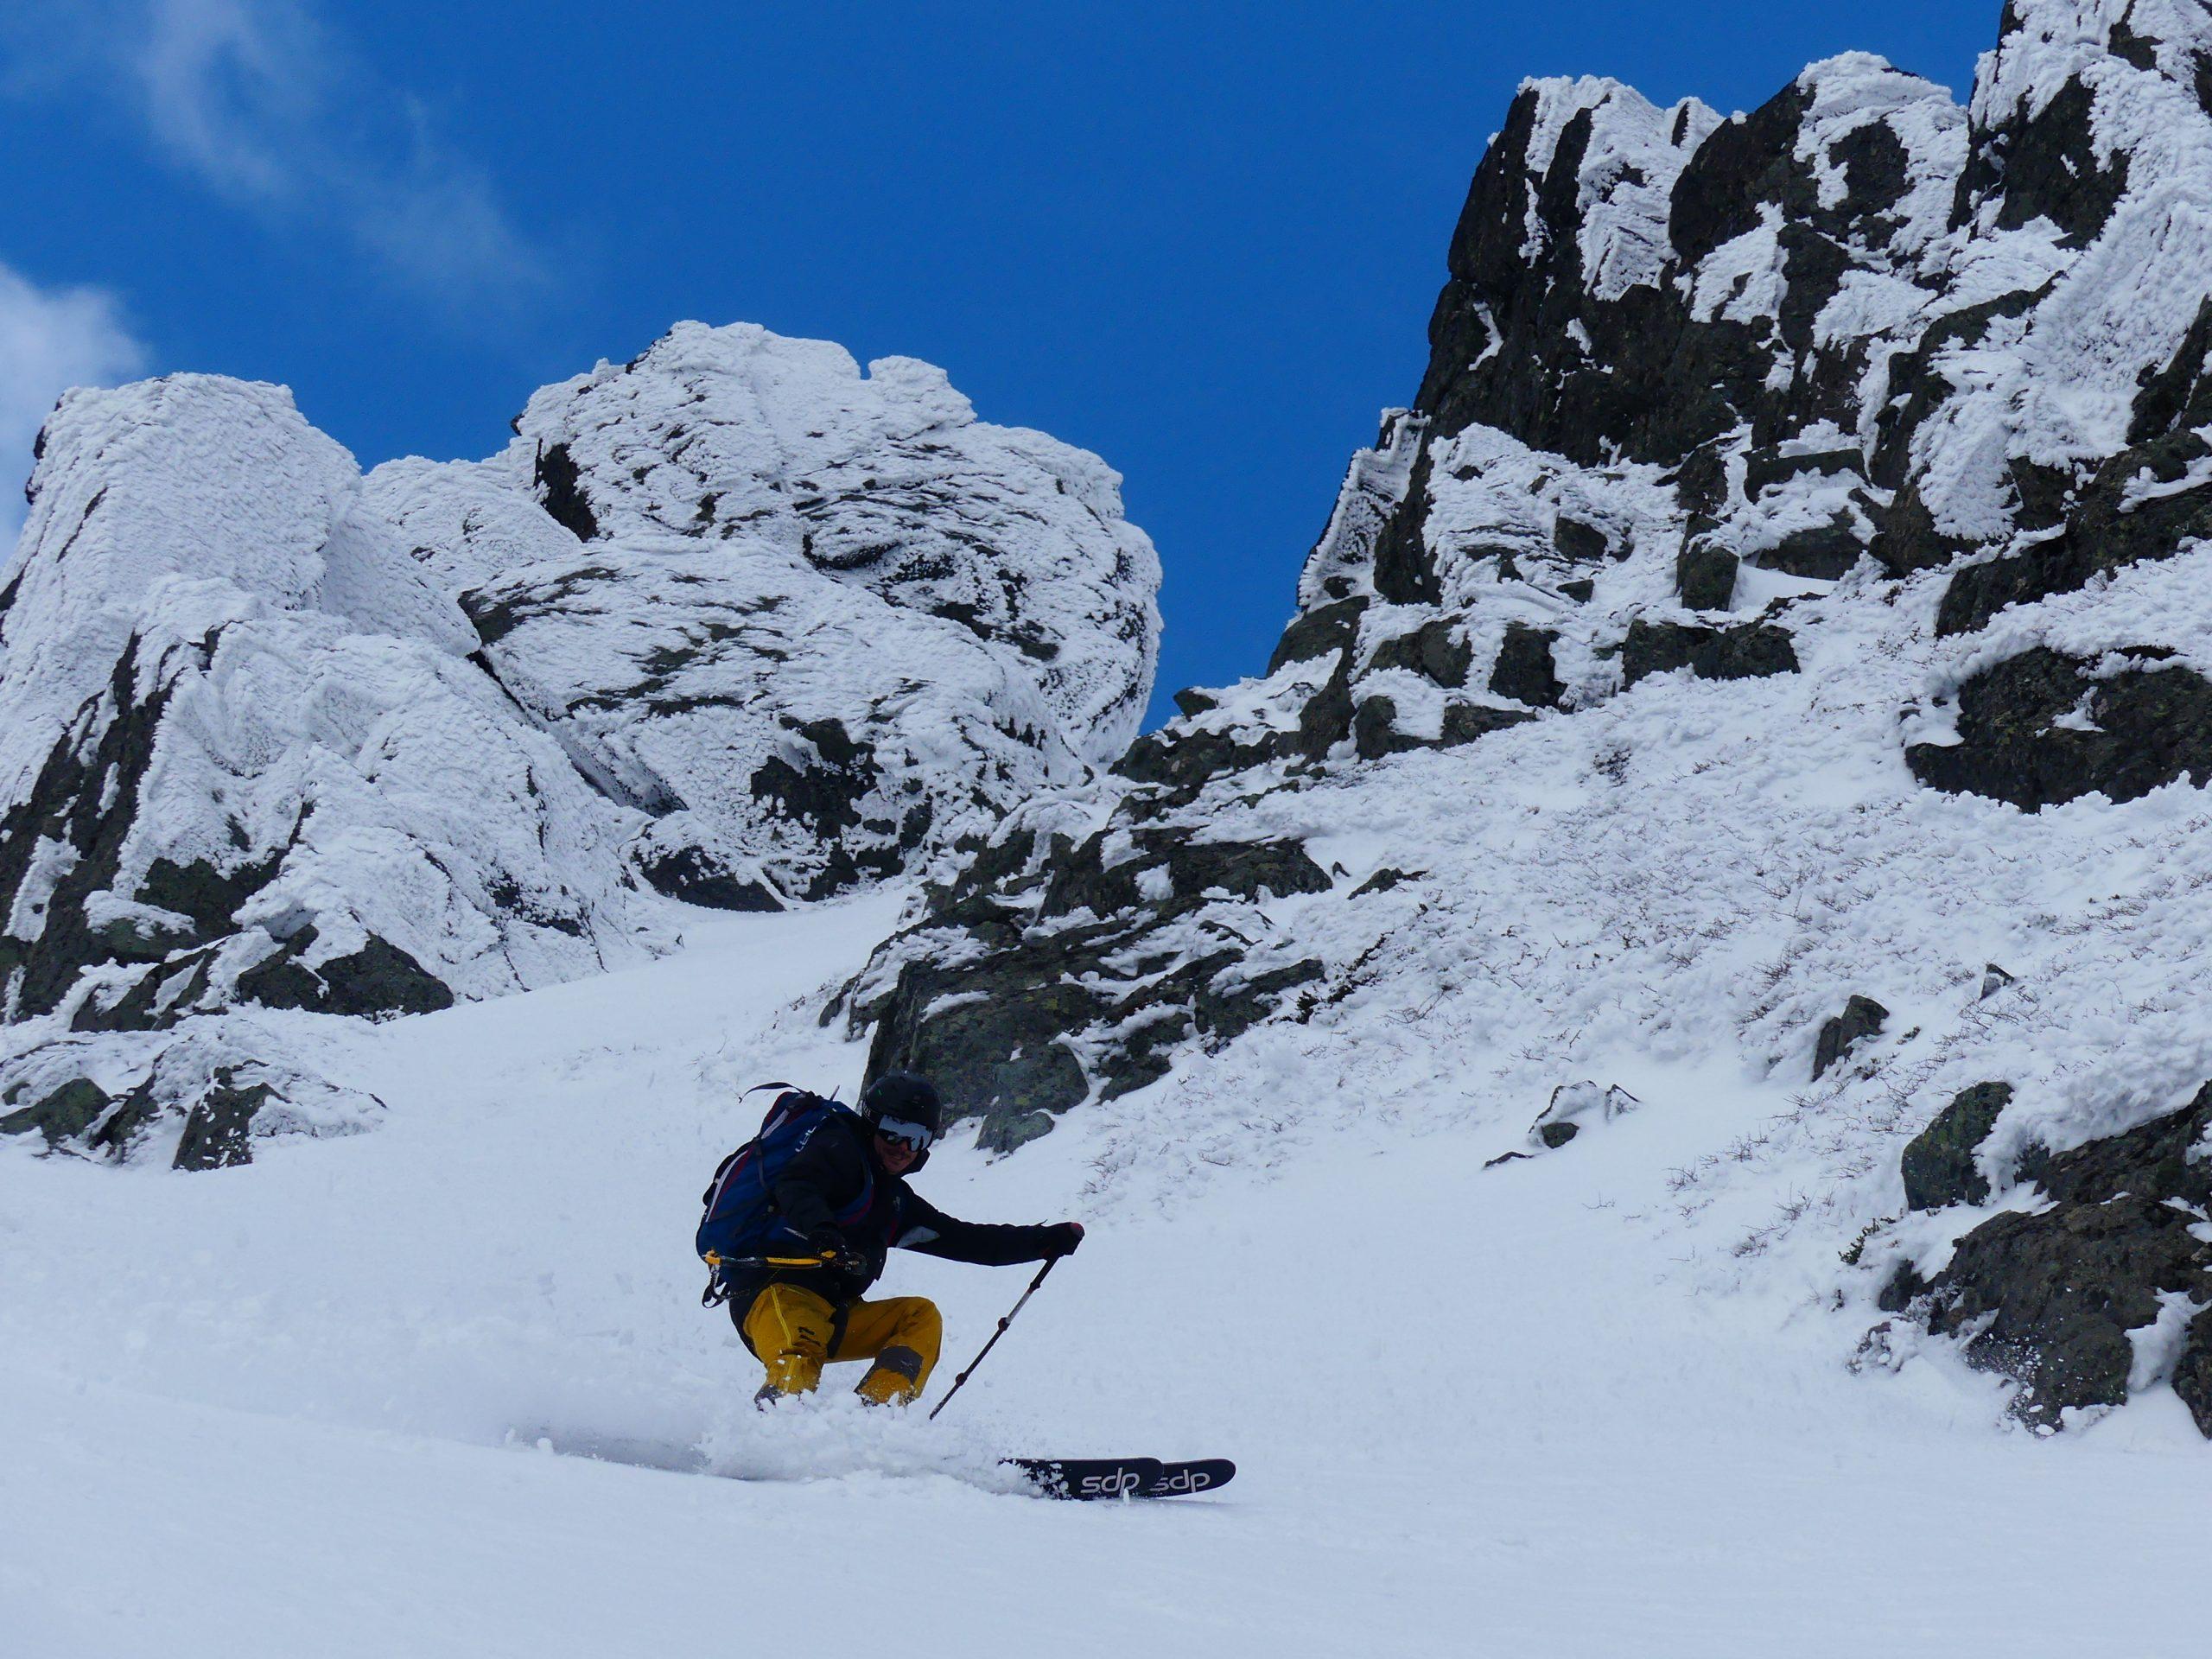 descenso en ski en las peinetas